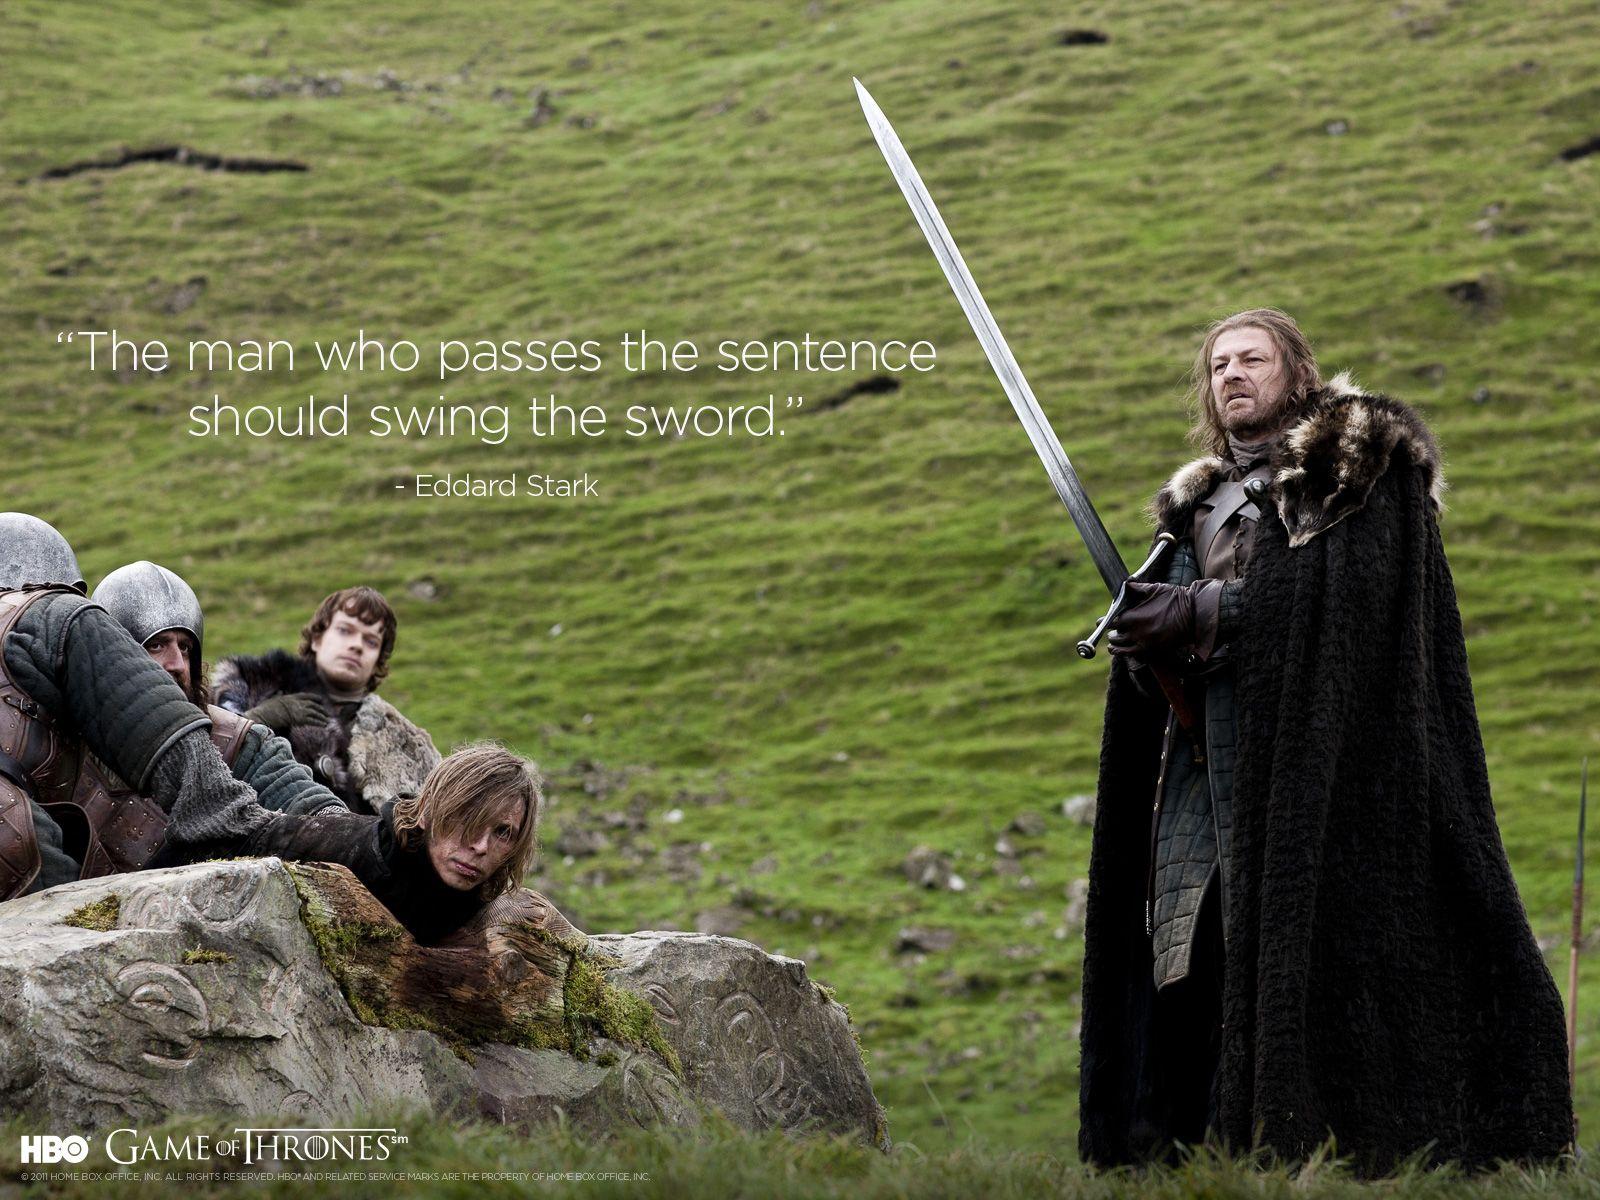 Pin By Rachel Cullens On Whakatauki Pinterest Game Of Thrones